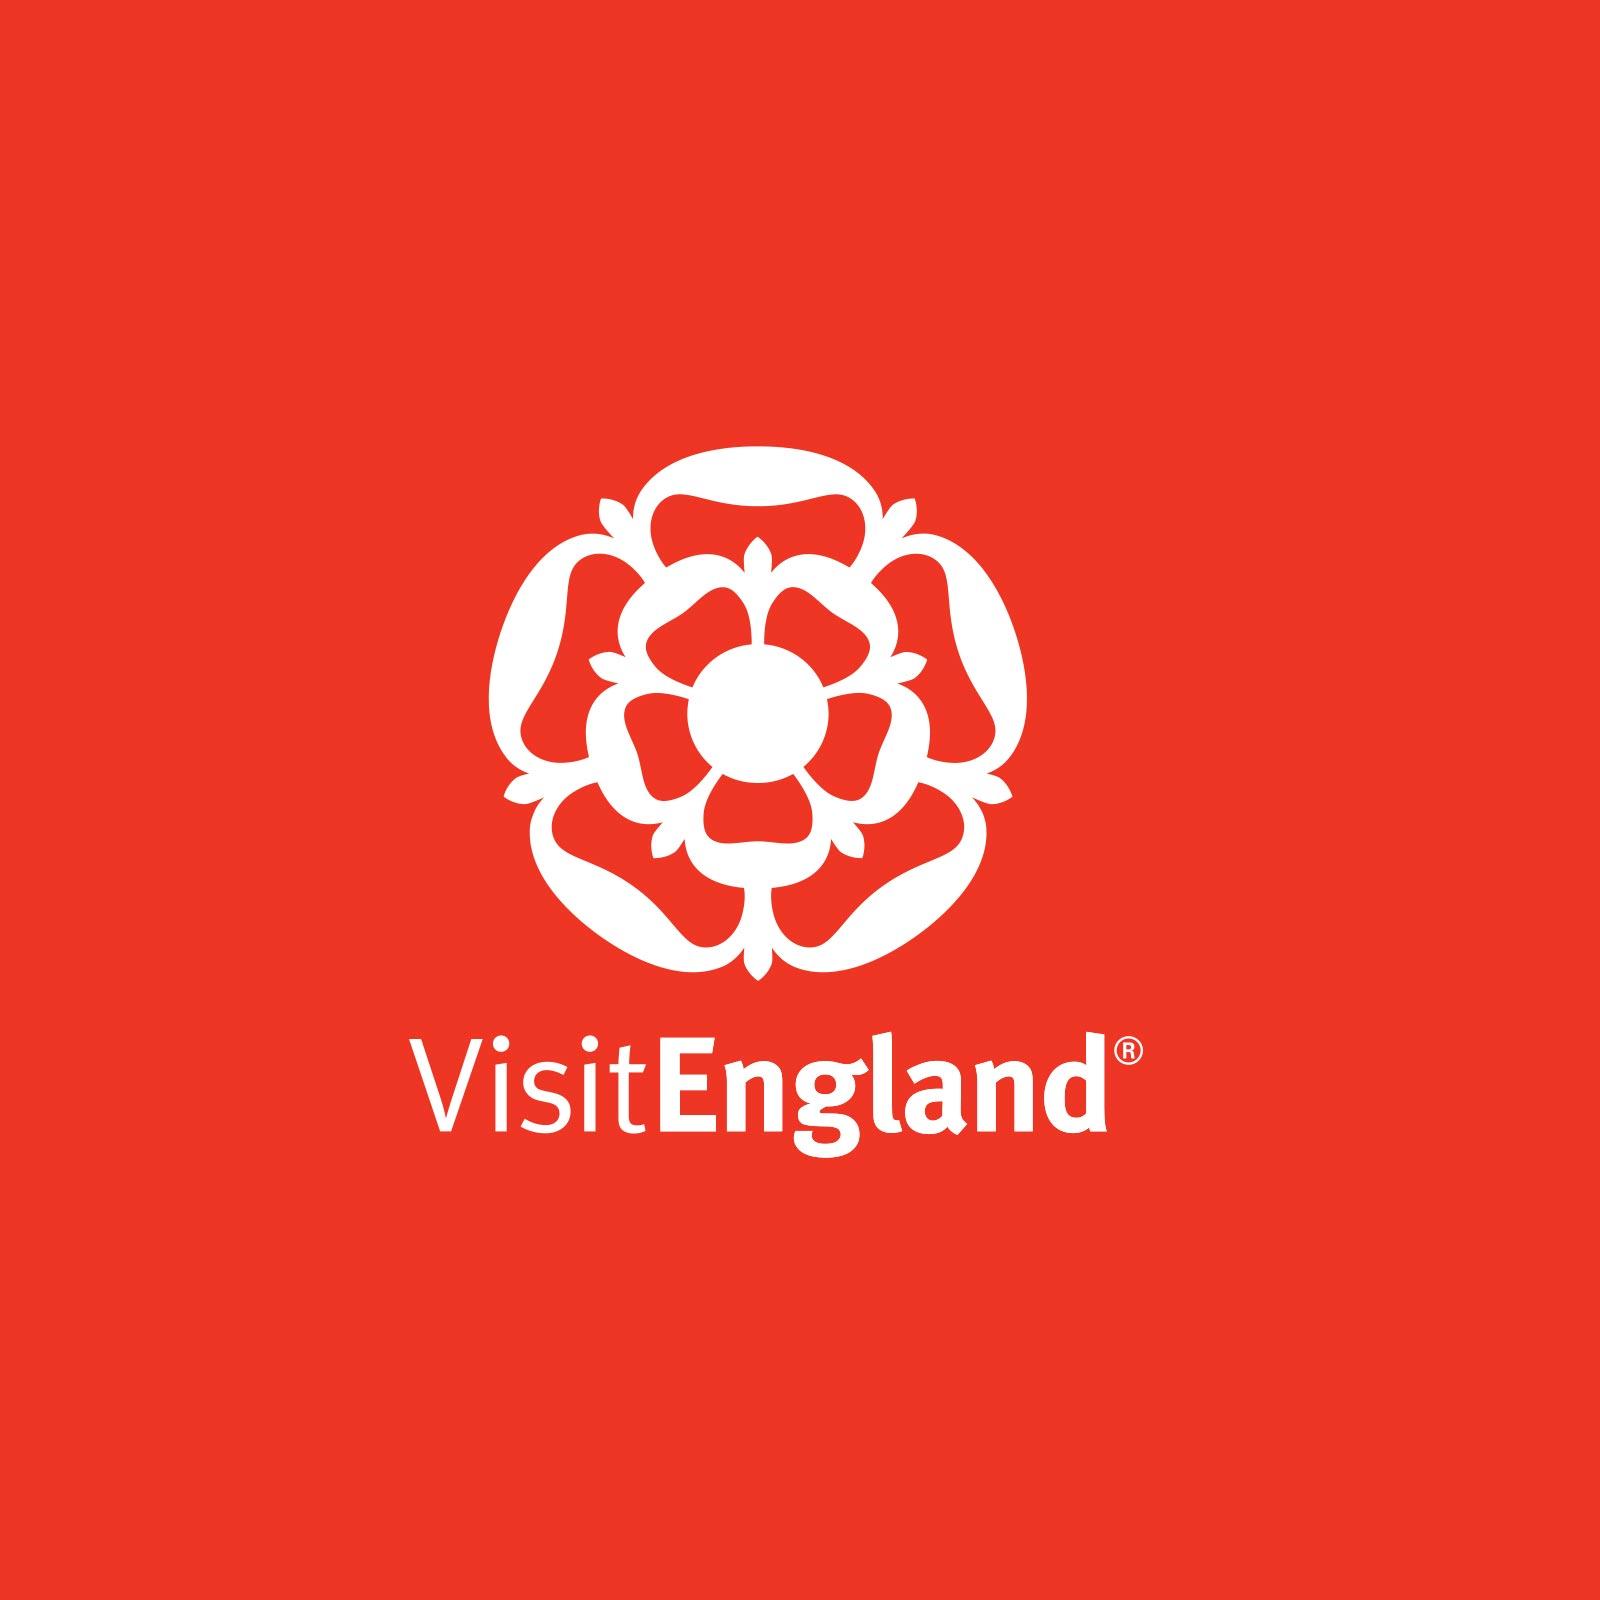 VisitEngland.jpg